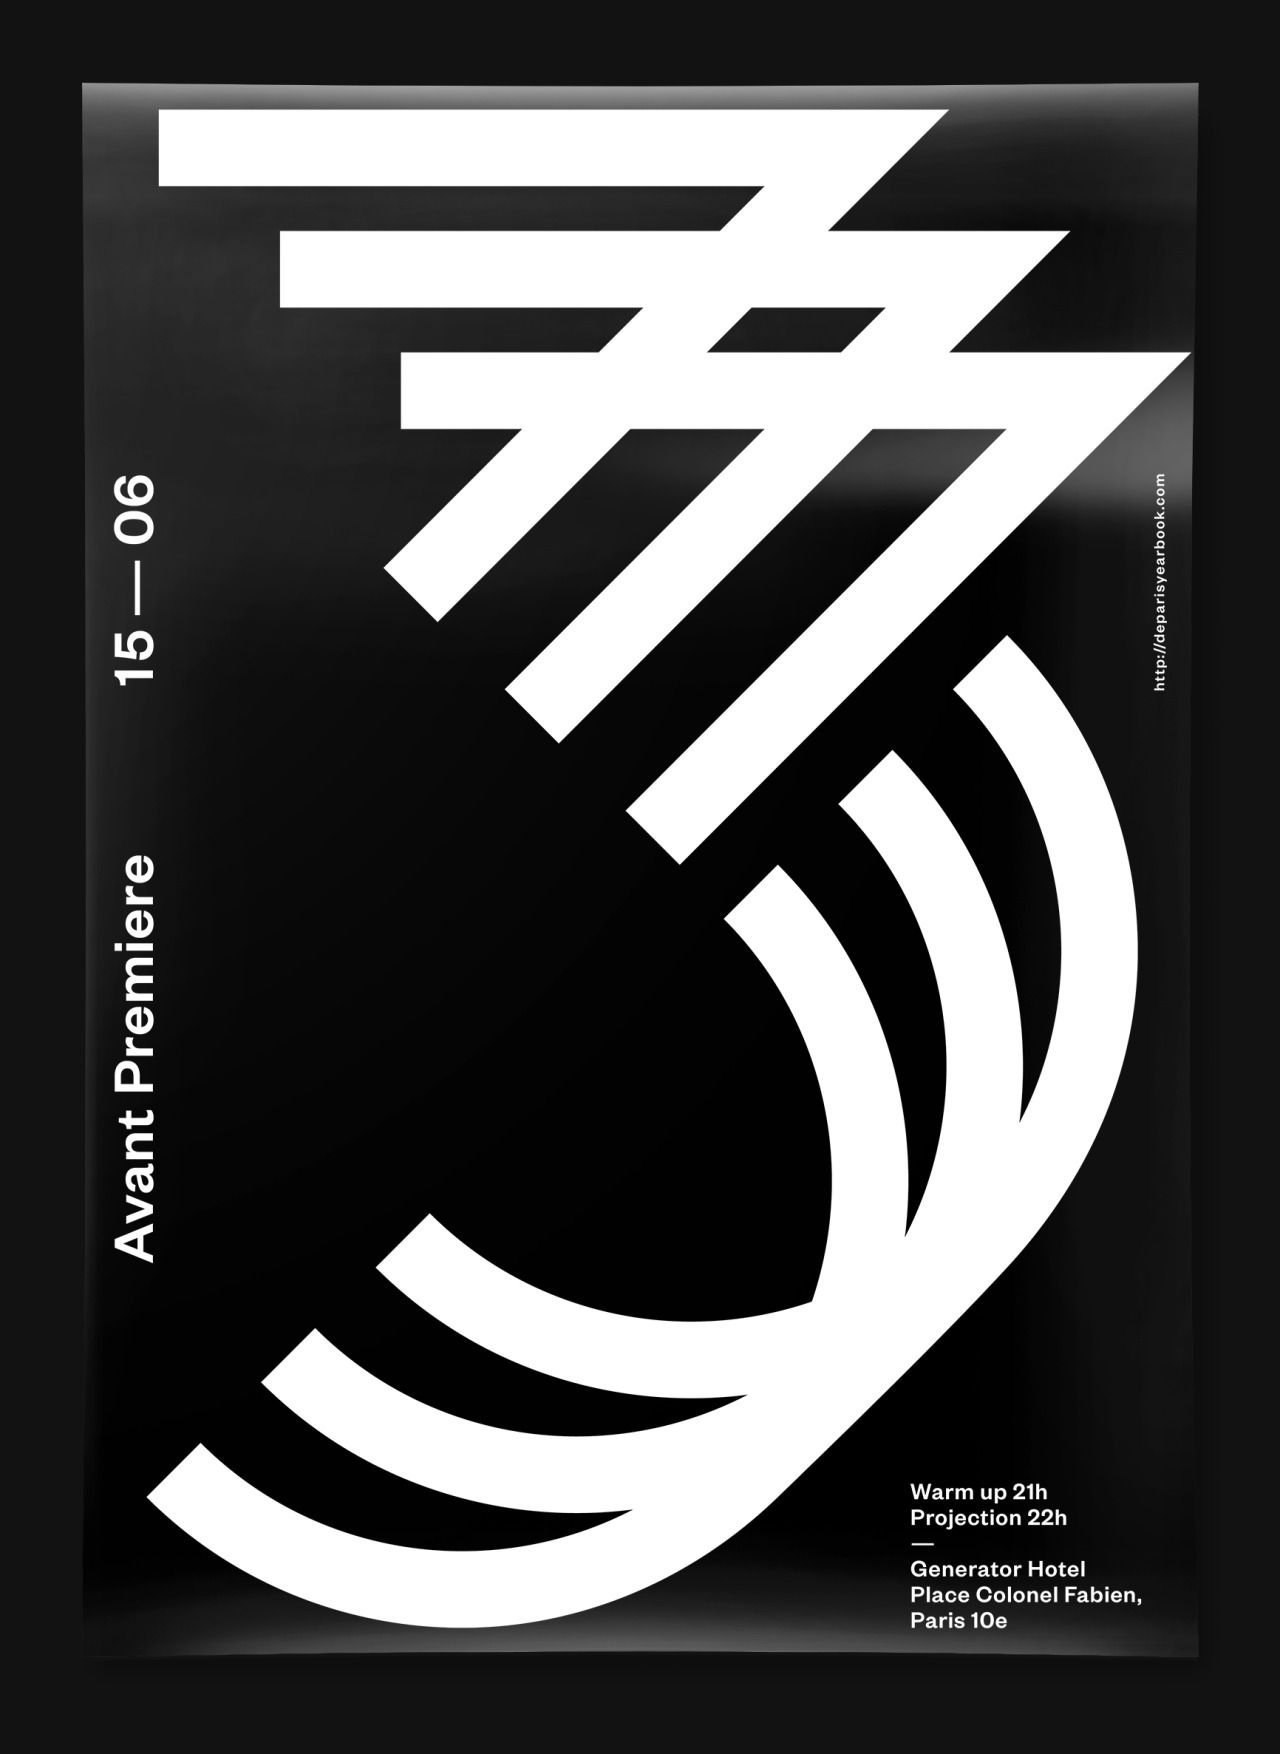 Poster design generator - Video 3 Logo Design And Promotional Poster By Studio Jimbo For De Paris